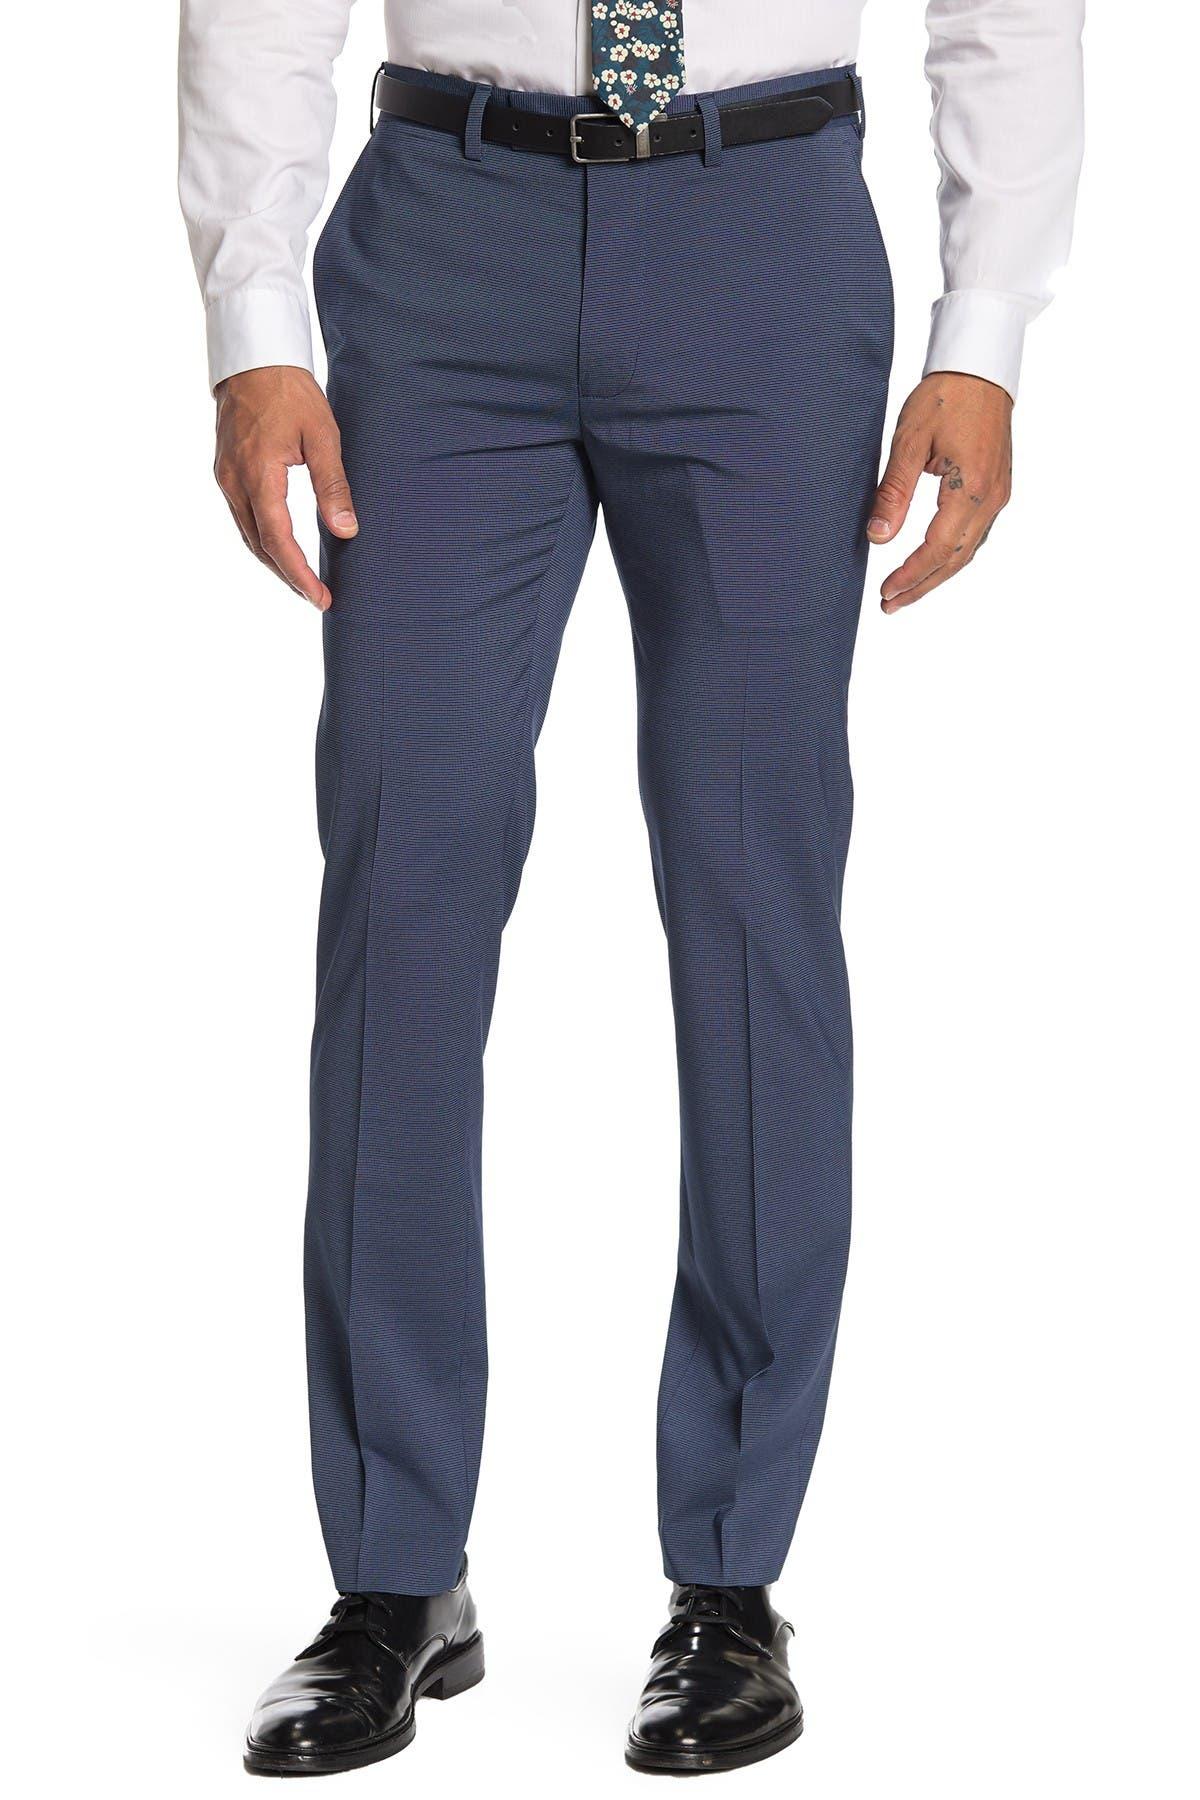 "Image of Louis Raphael Tick Dot Slim Fit Trousers - 30-34"" Inseam"